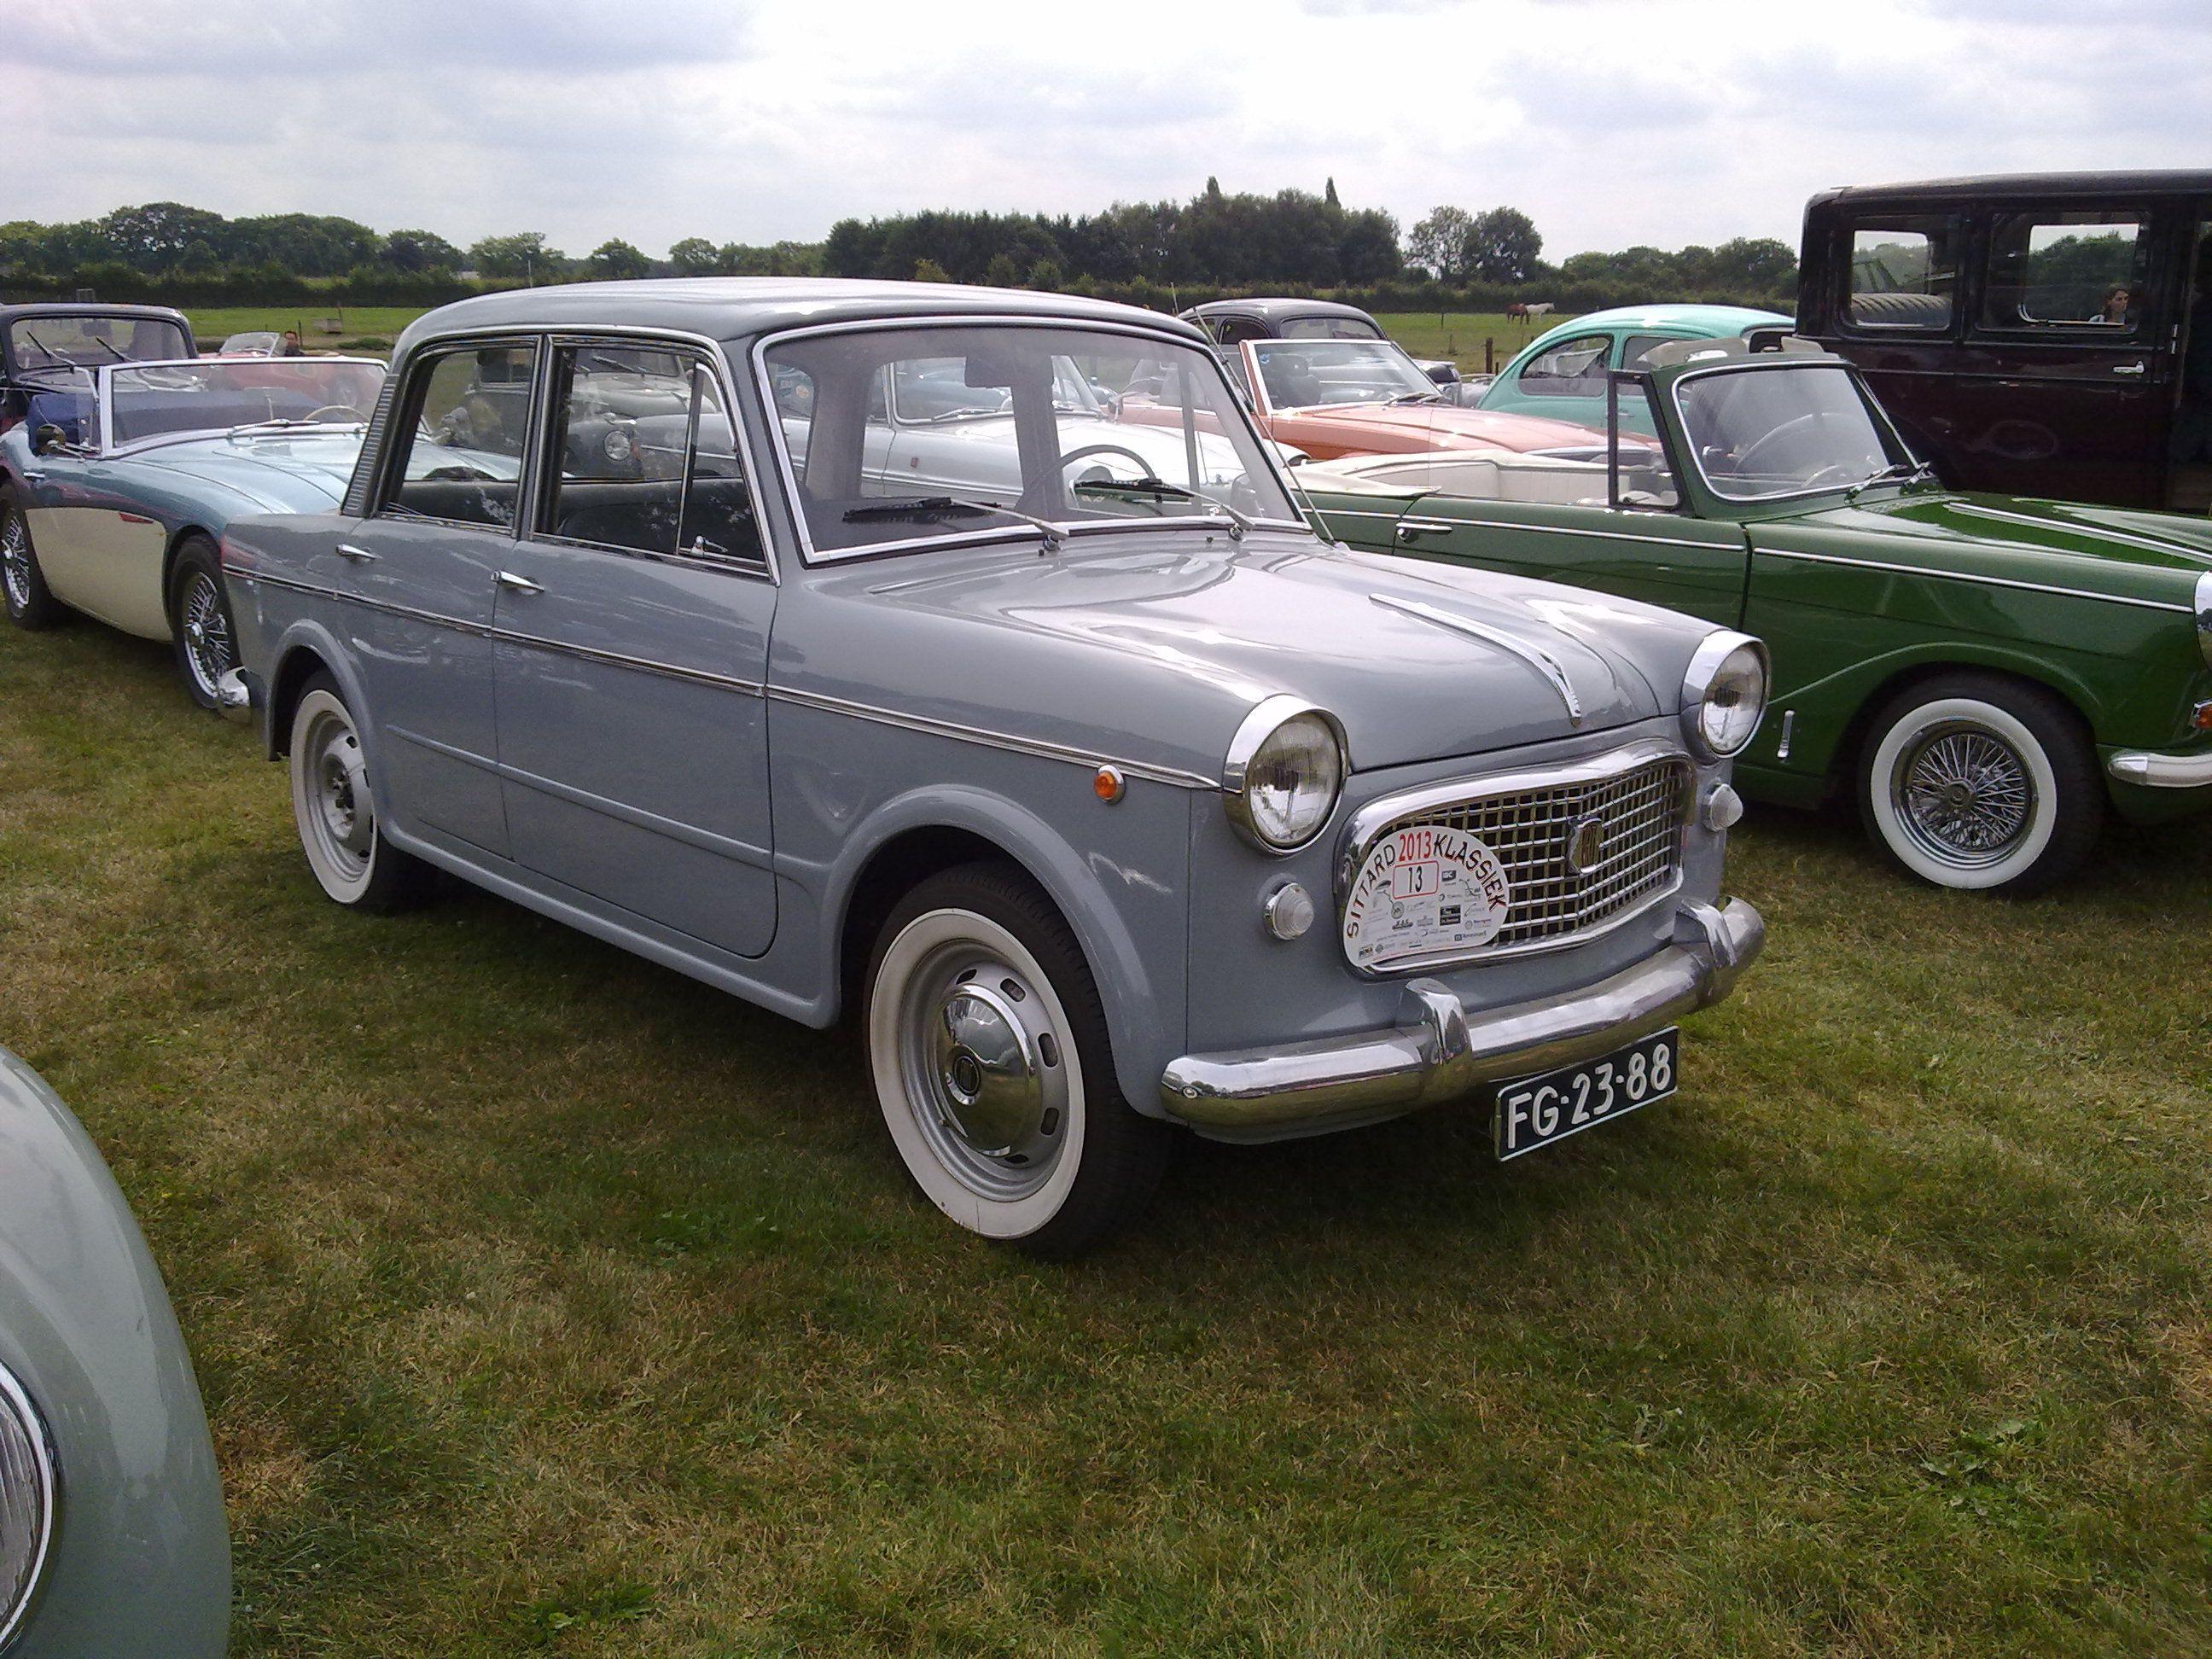 Fiat 1100 Fiat Cars Fiat Motor Car